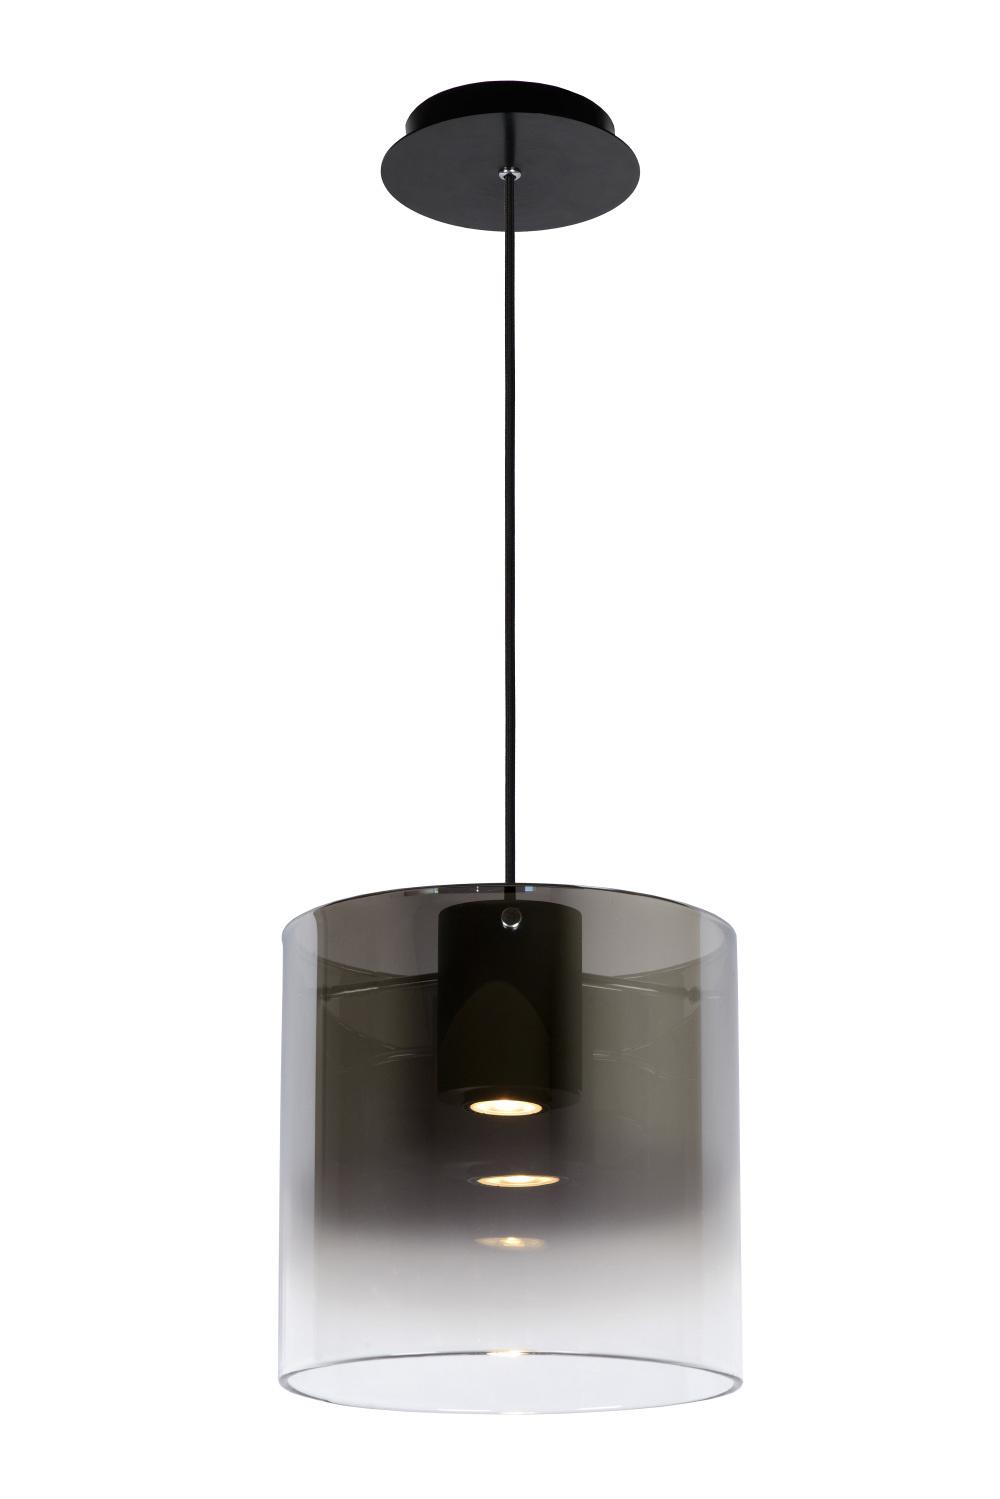 Lucide OWINO Hanglamp-Fumé-Ø25-LED Dimb.-1xGU10-5W-3000K